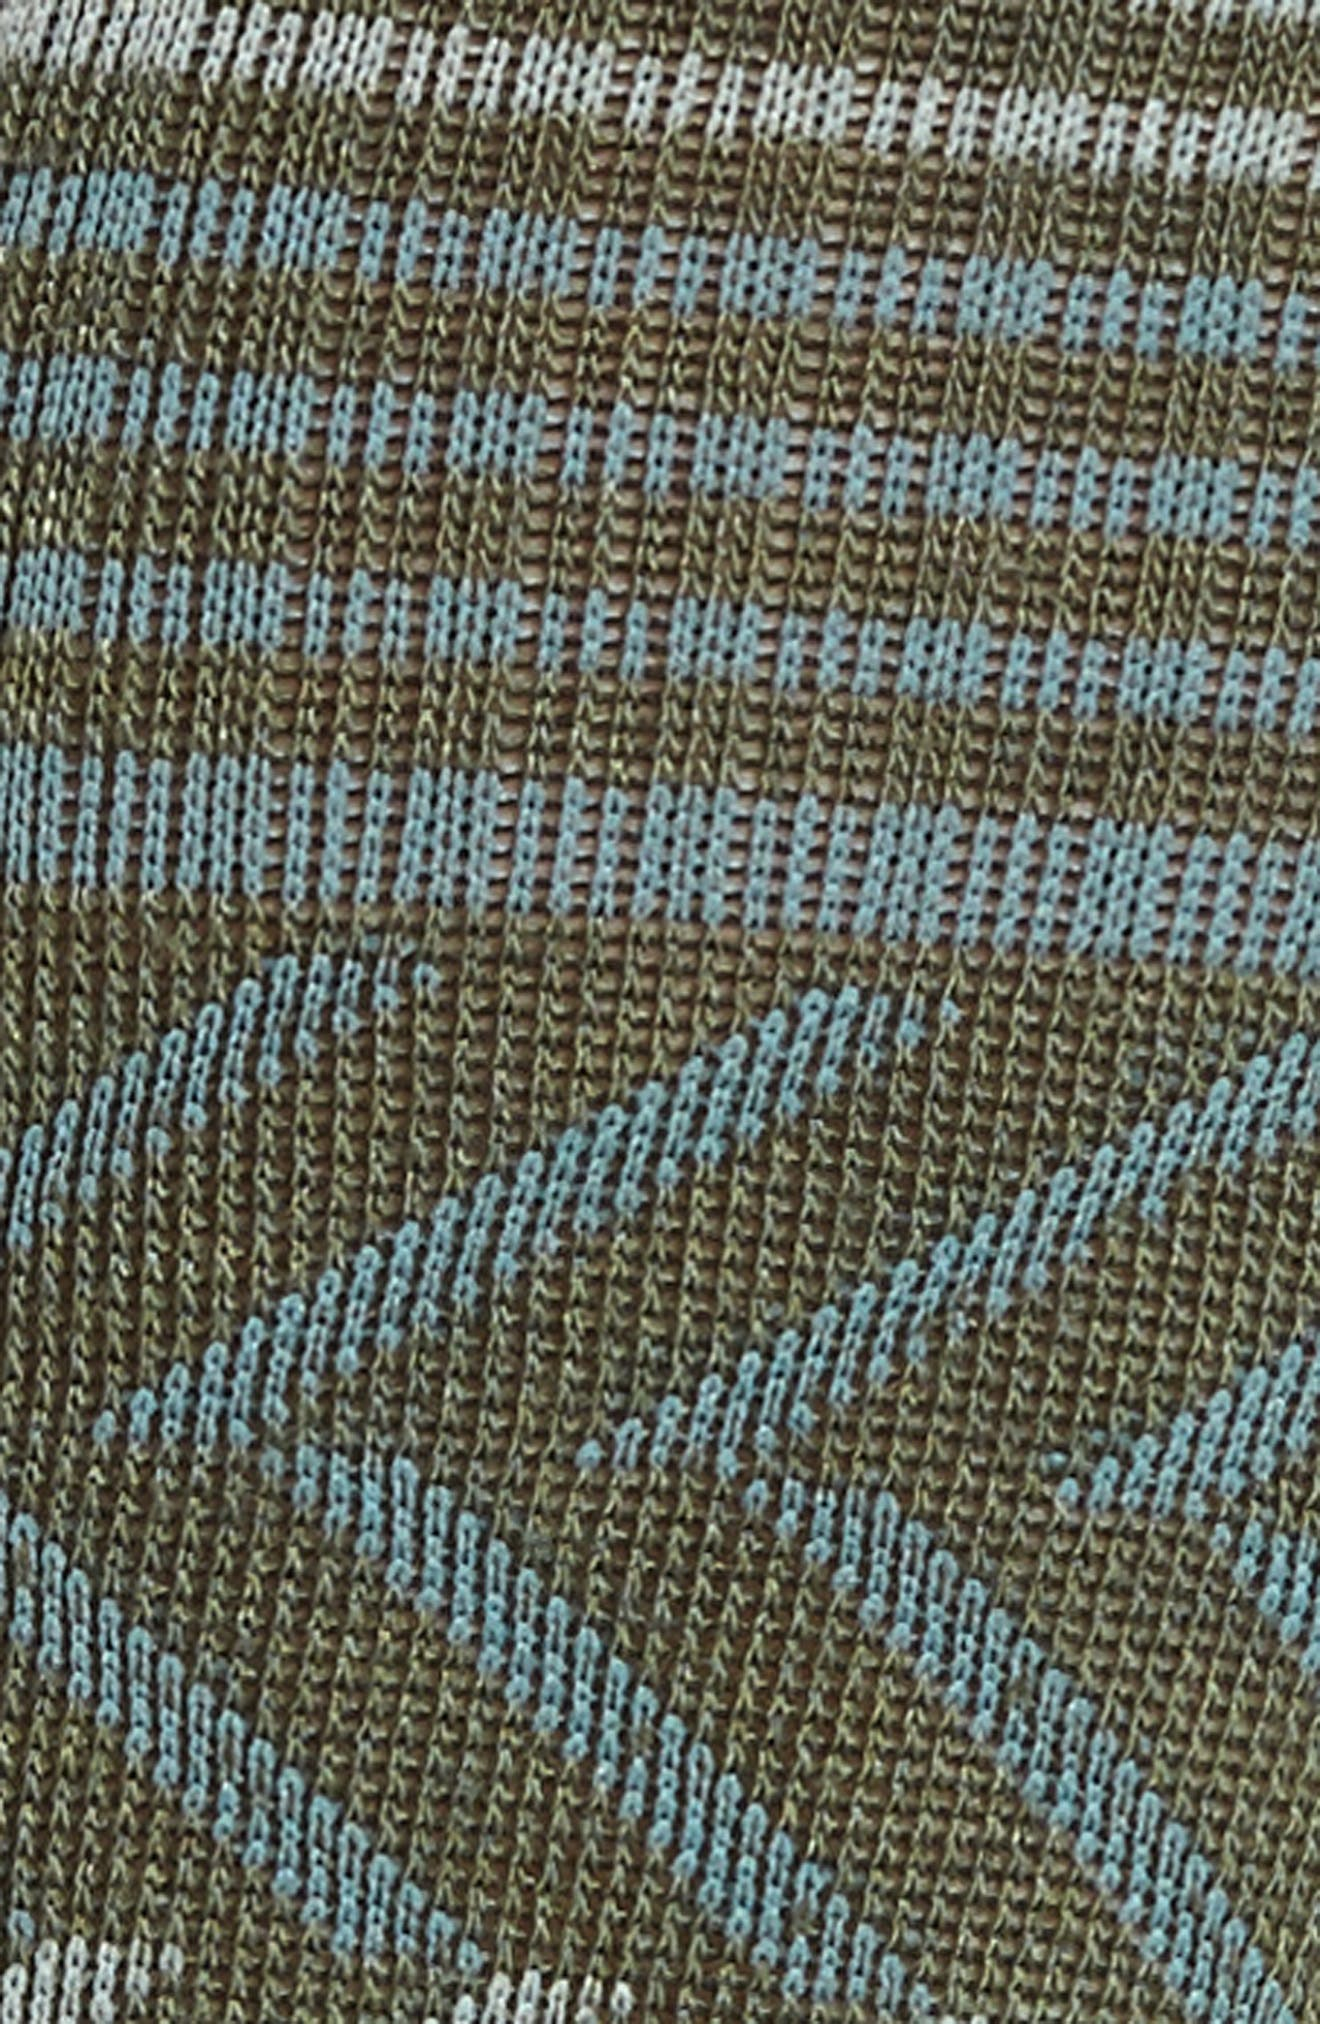 Graduated Compression Socks,                             Alternate thumbnail 2, color,                             EUCALYPTUS